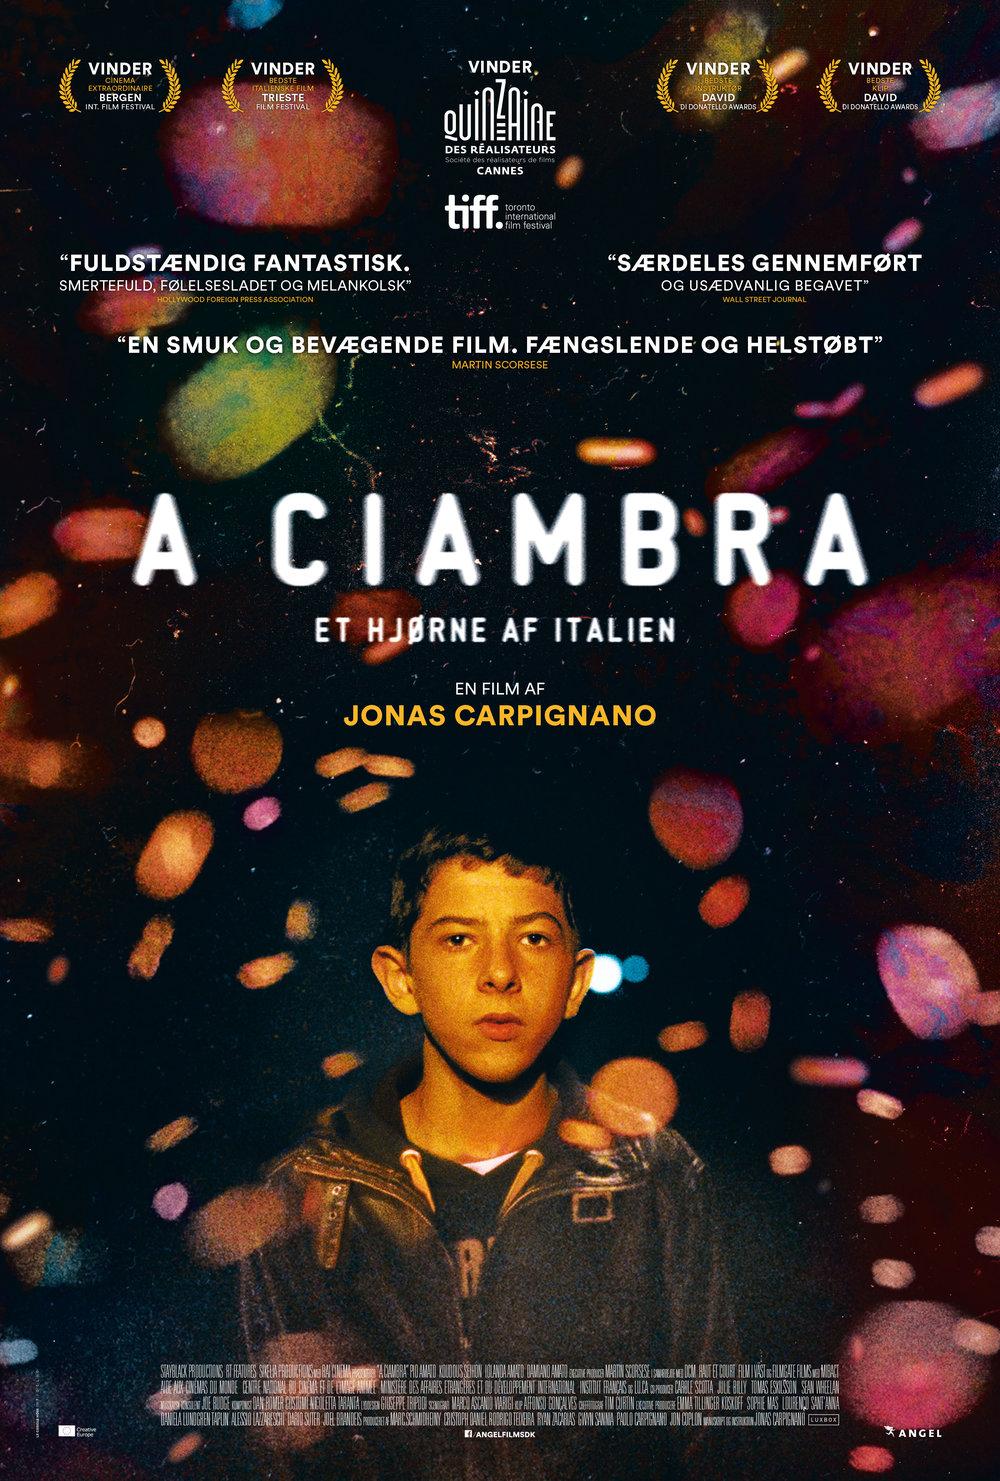 poster_ciambra-1.jpg